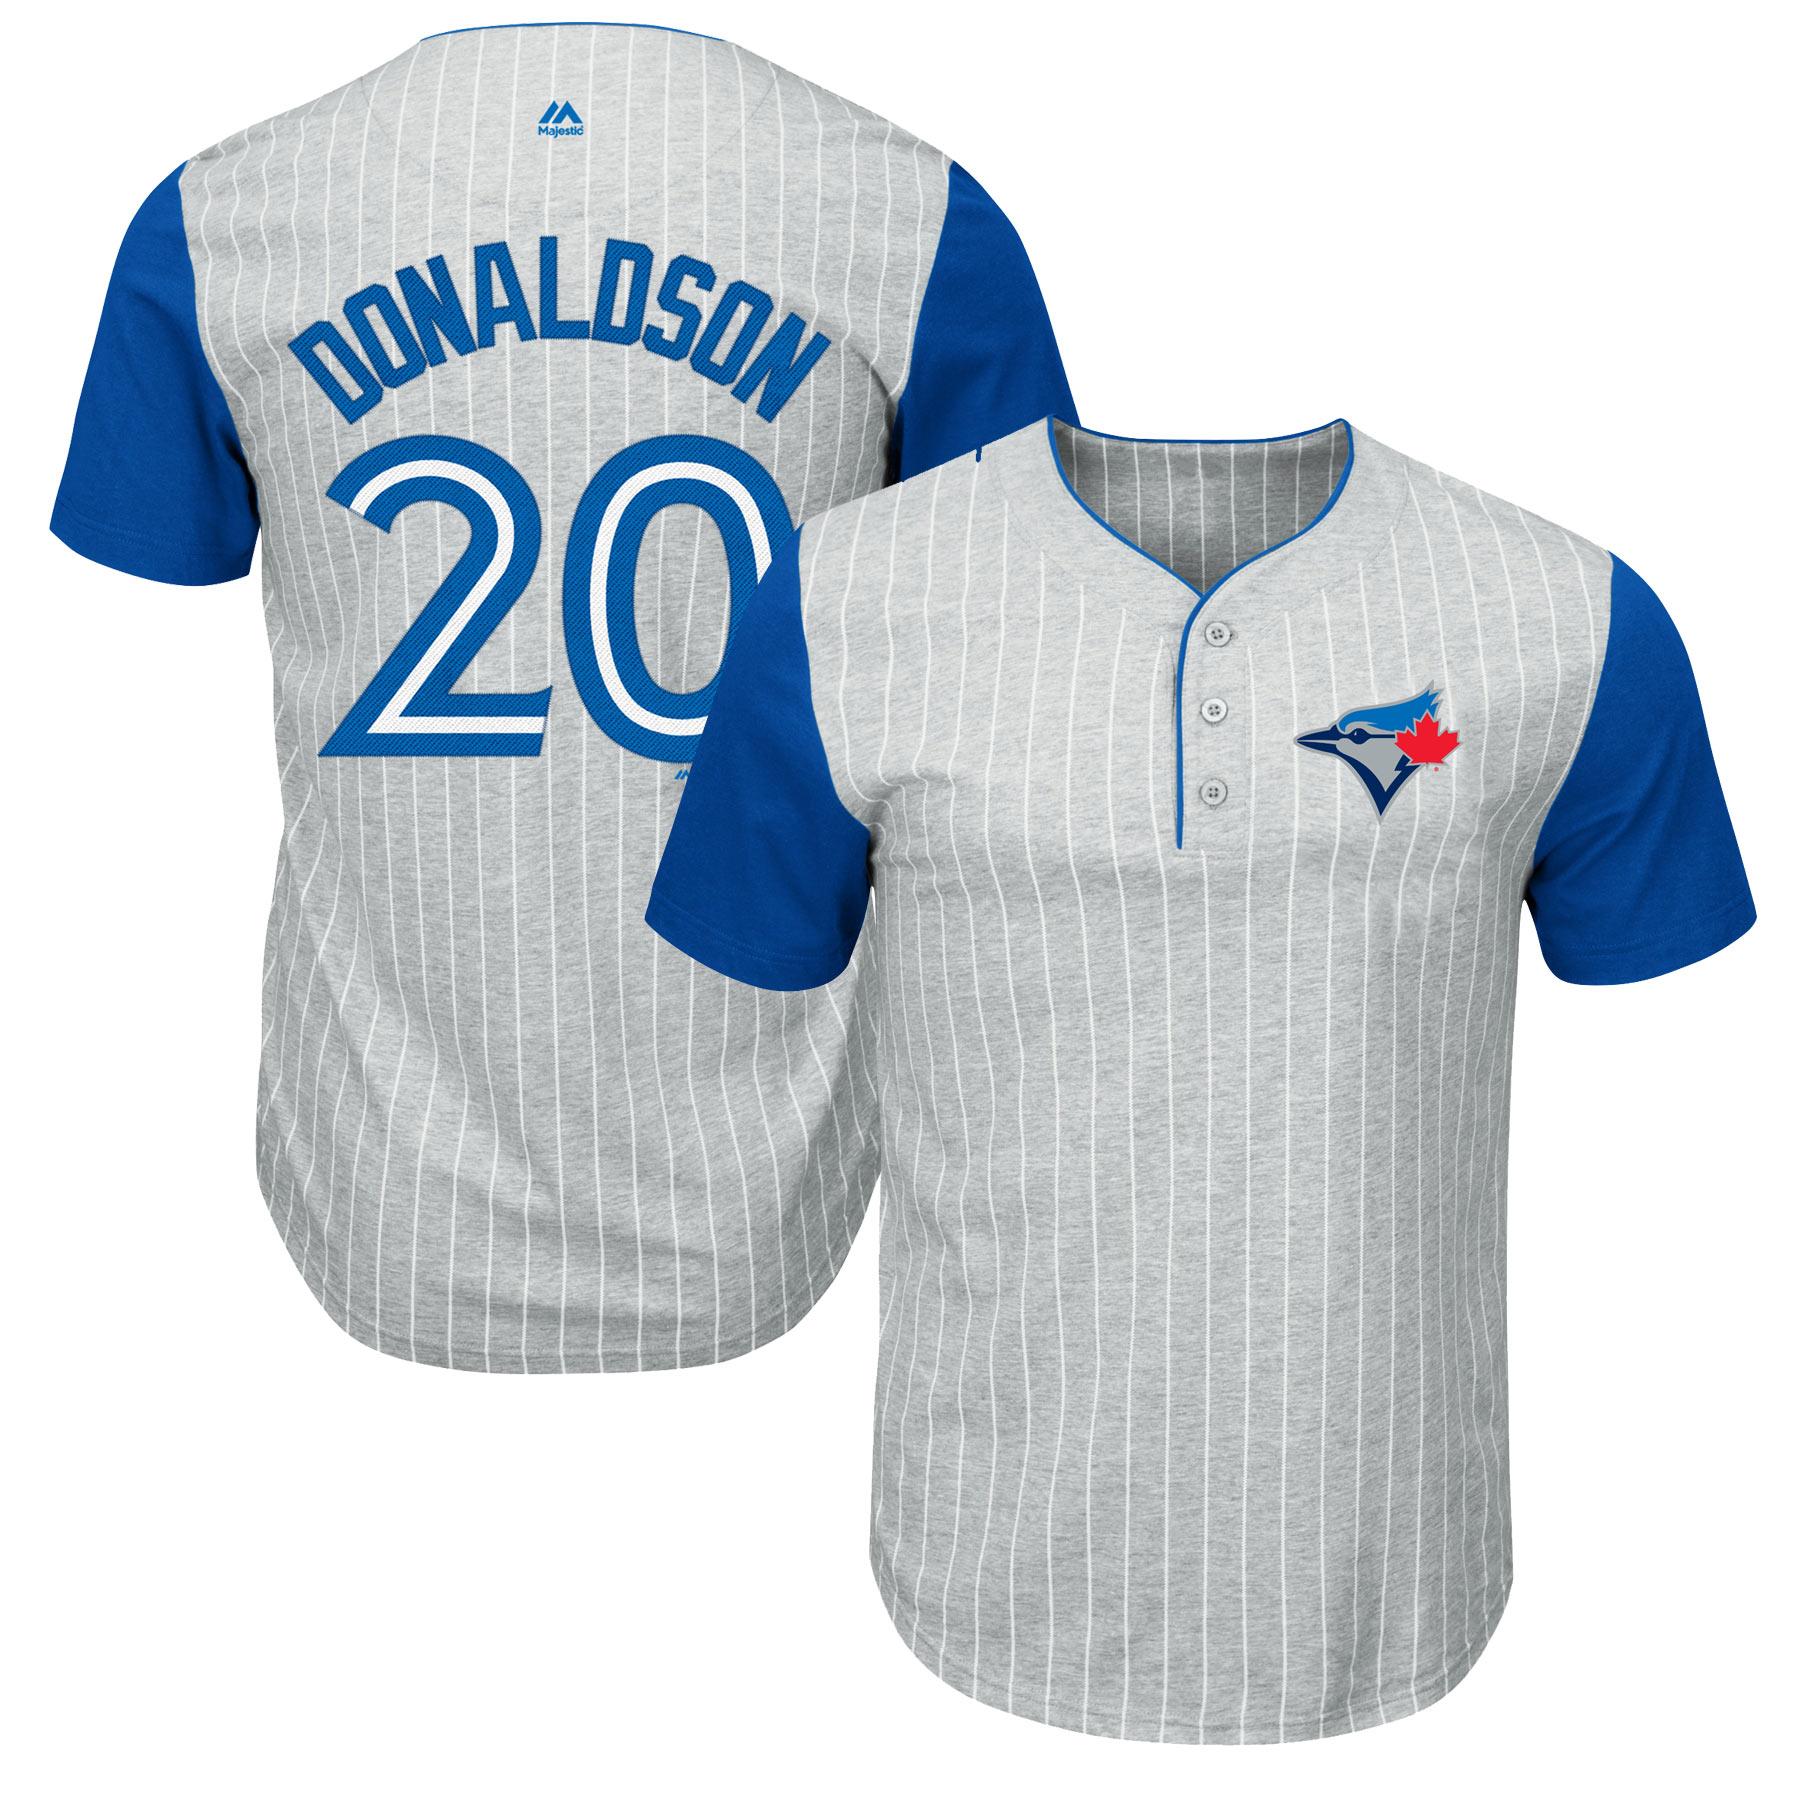 Josh Donaldson Toronto Blue Jays Majestic Big & Tall Pinstripe Player T-Shirt - Gray/Royal